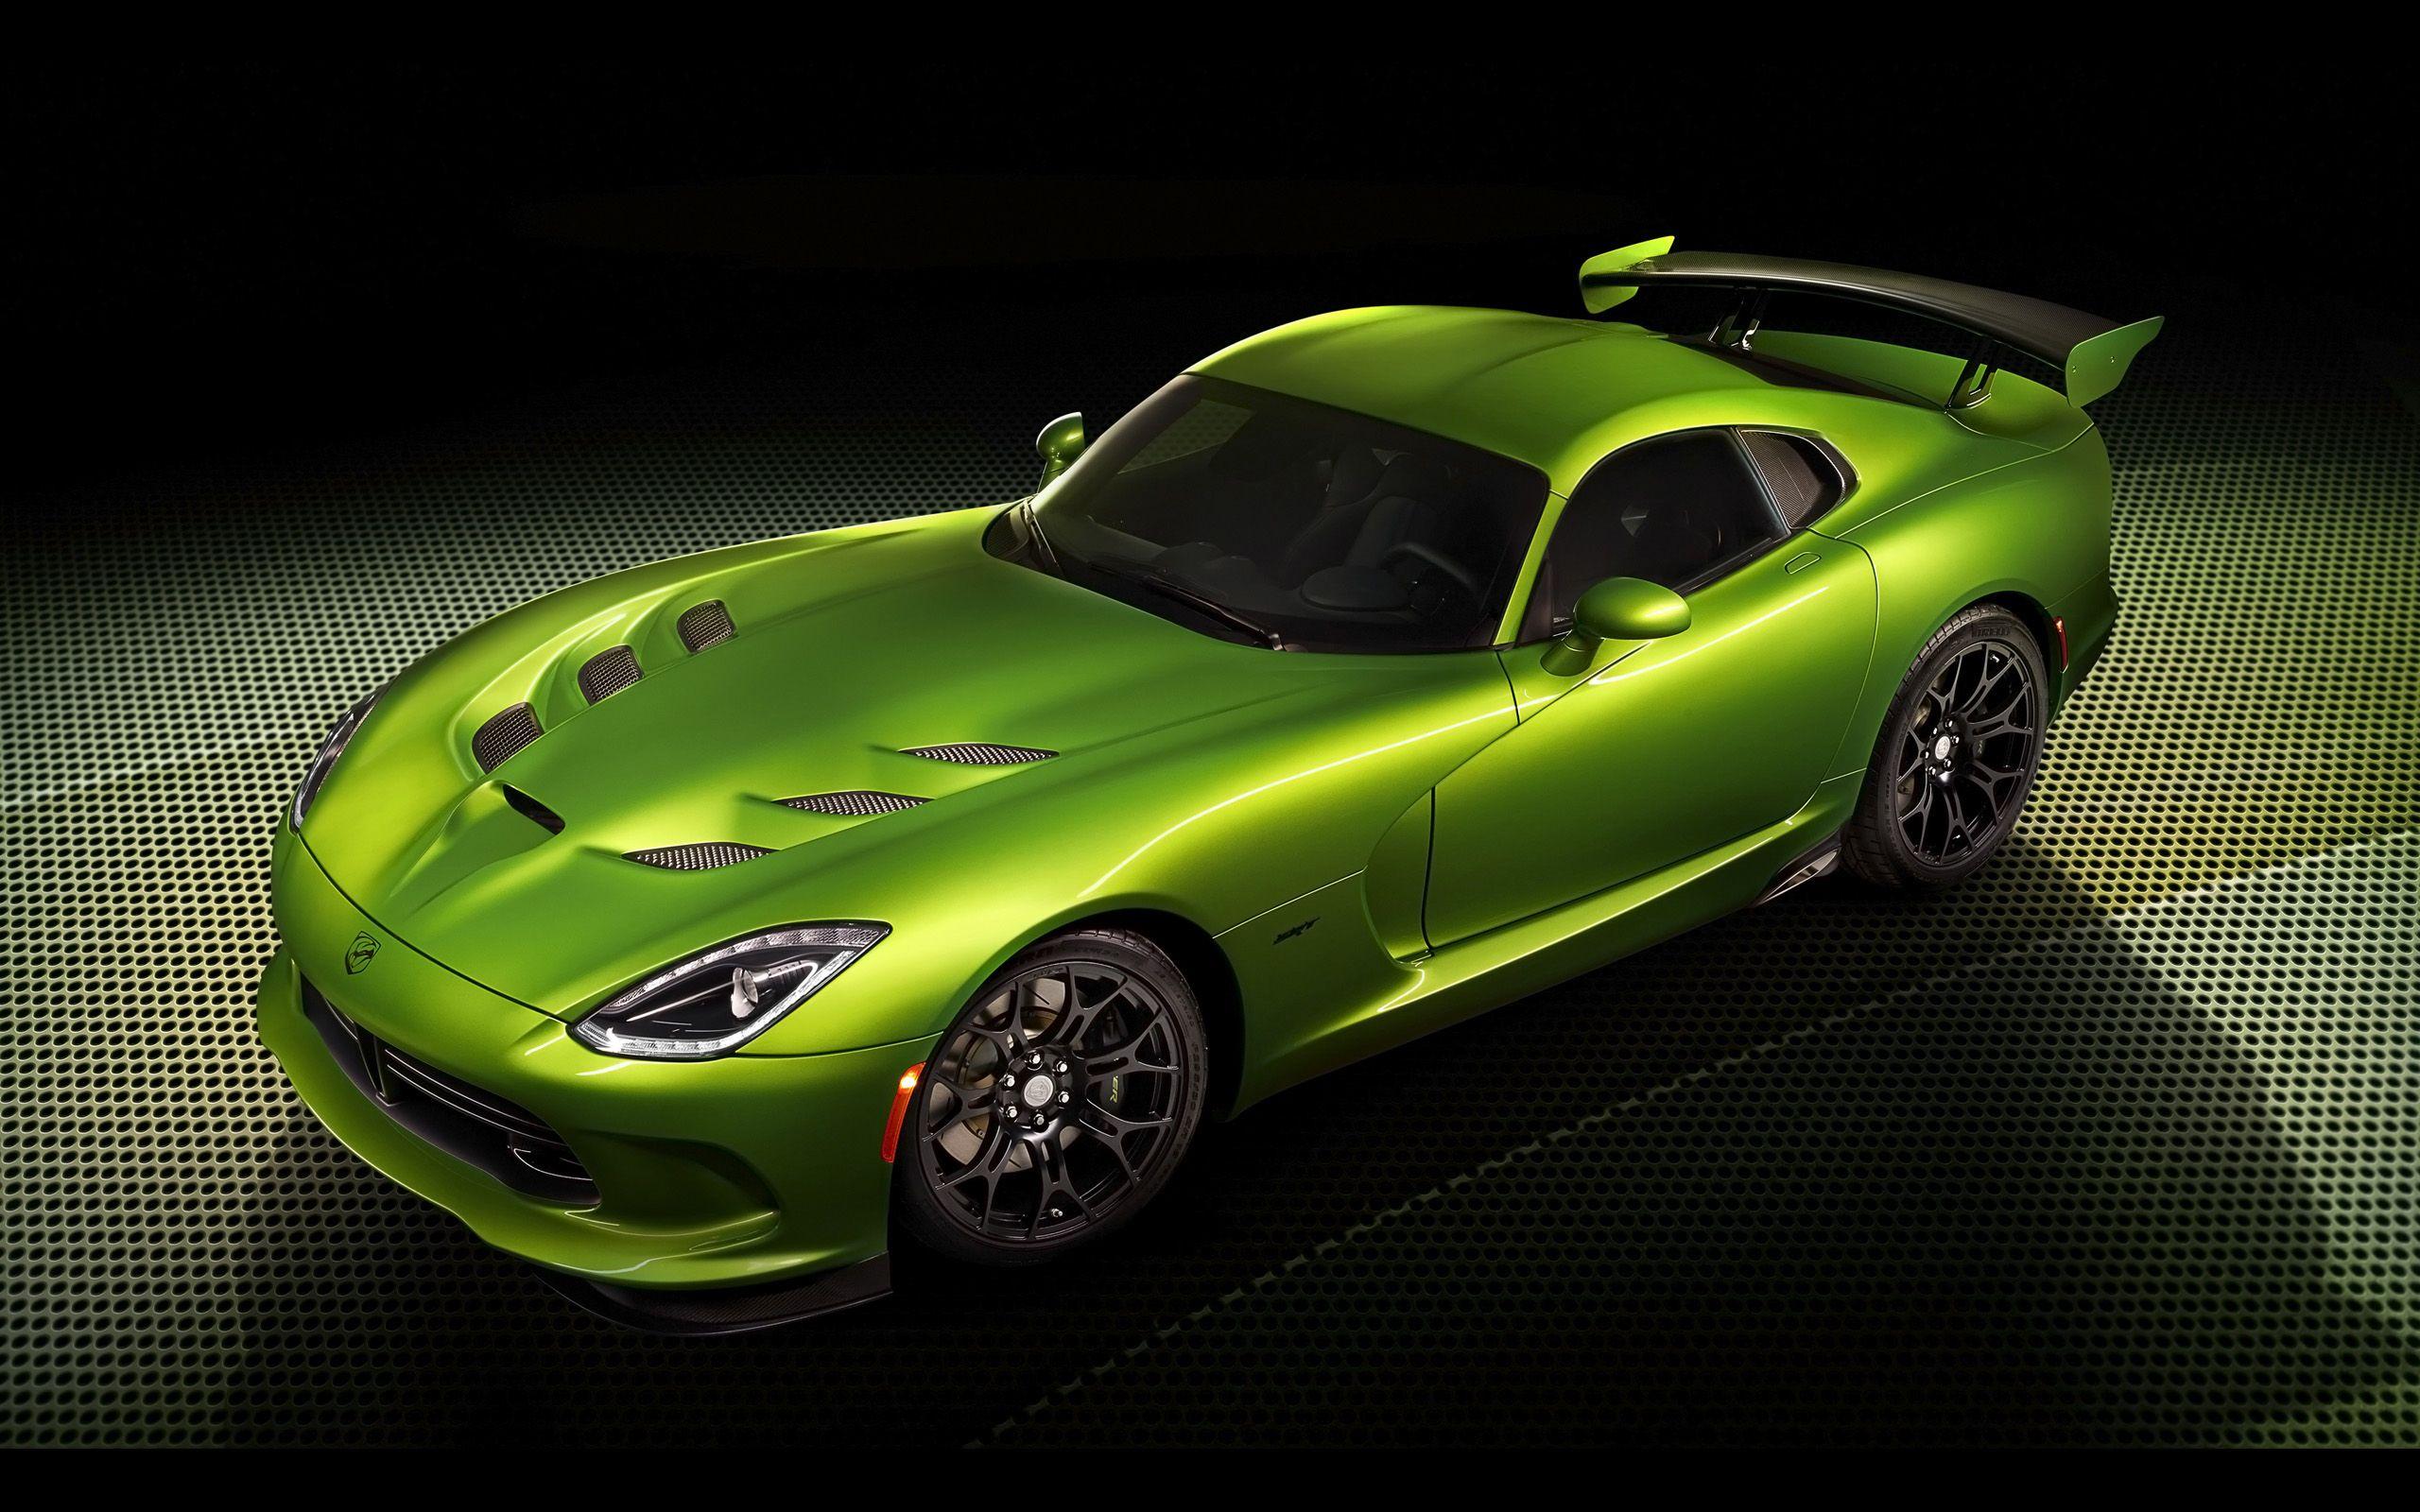 lada 2014 concept #51 | supercars rtb | pinterest